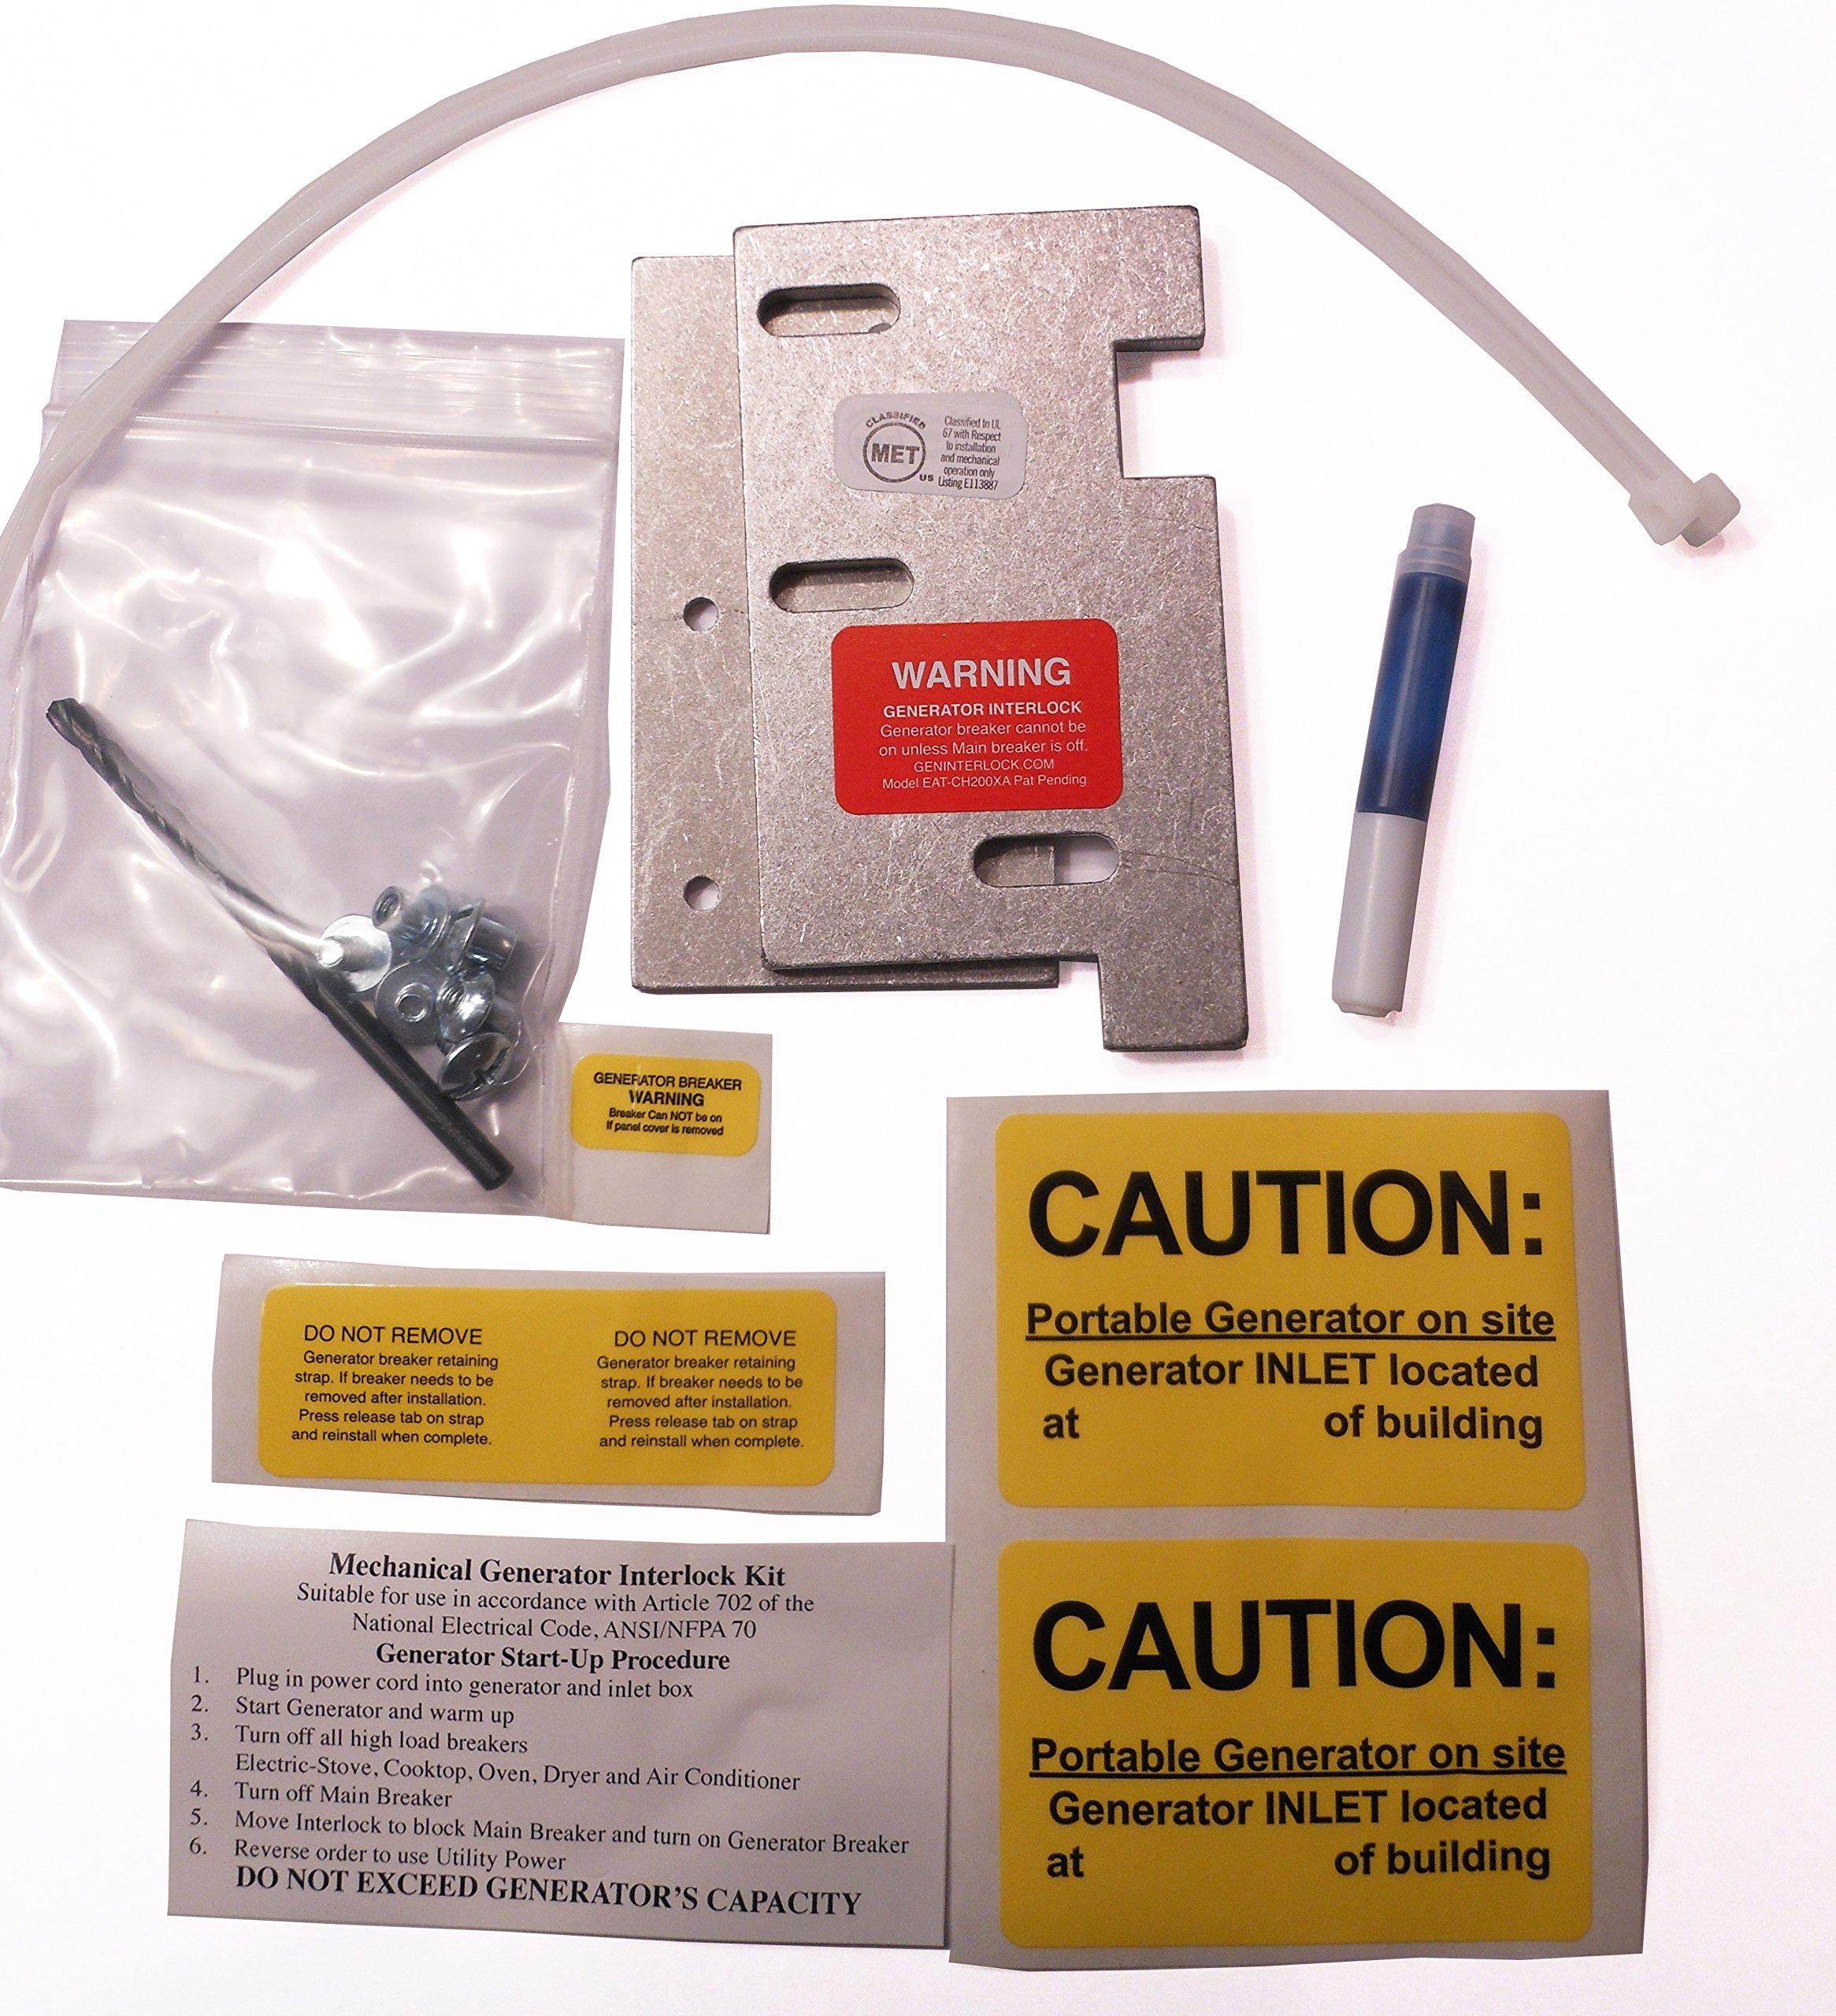 EAT-CH200XA Eaton or Cutler Hammer Generator Interlock Kit Vertical Throw Main 150 or 200 amp Panel Generator Interlock Kit